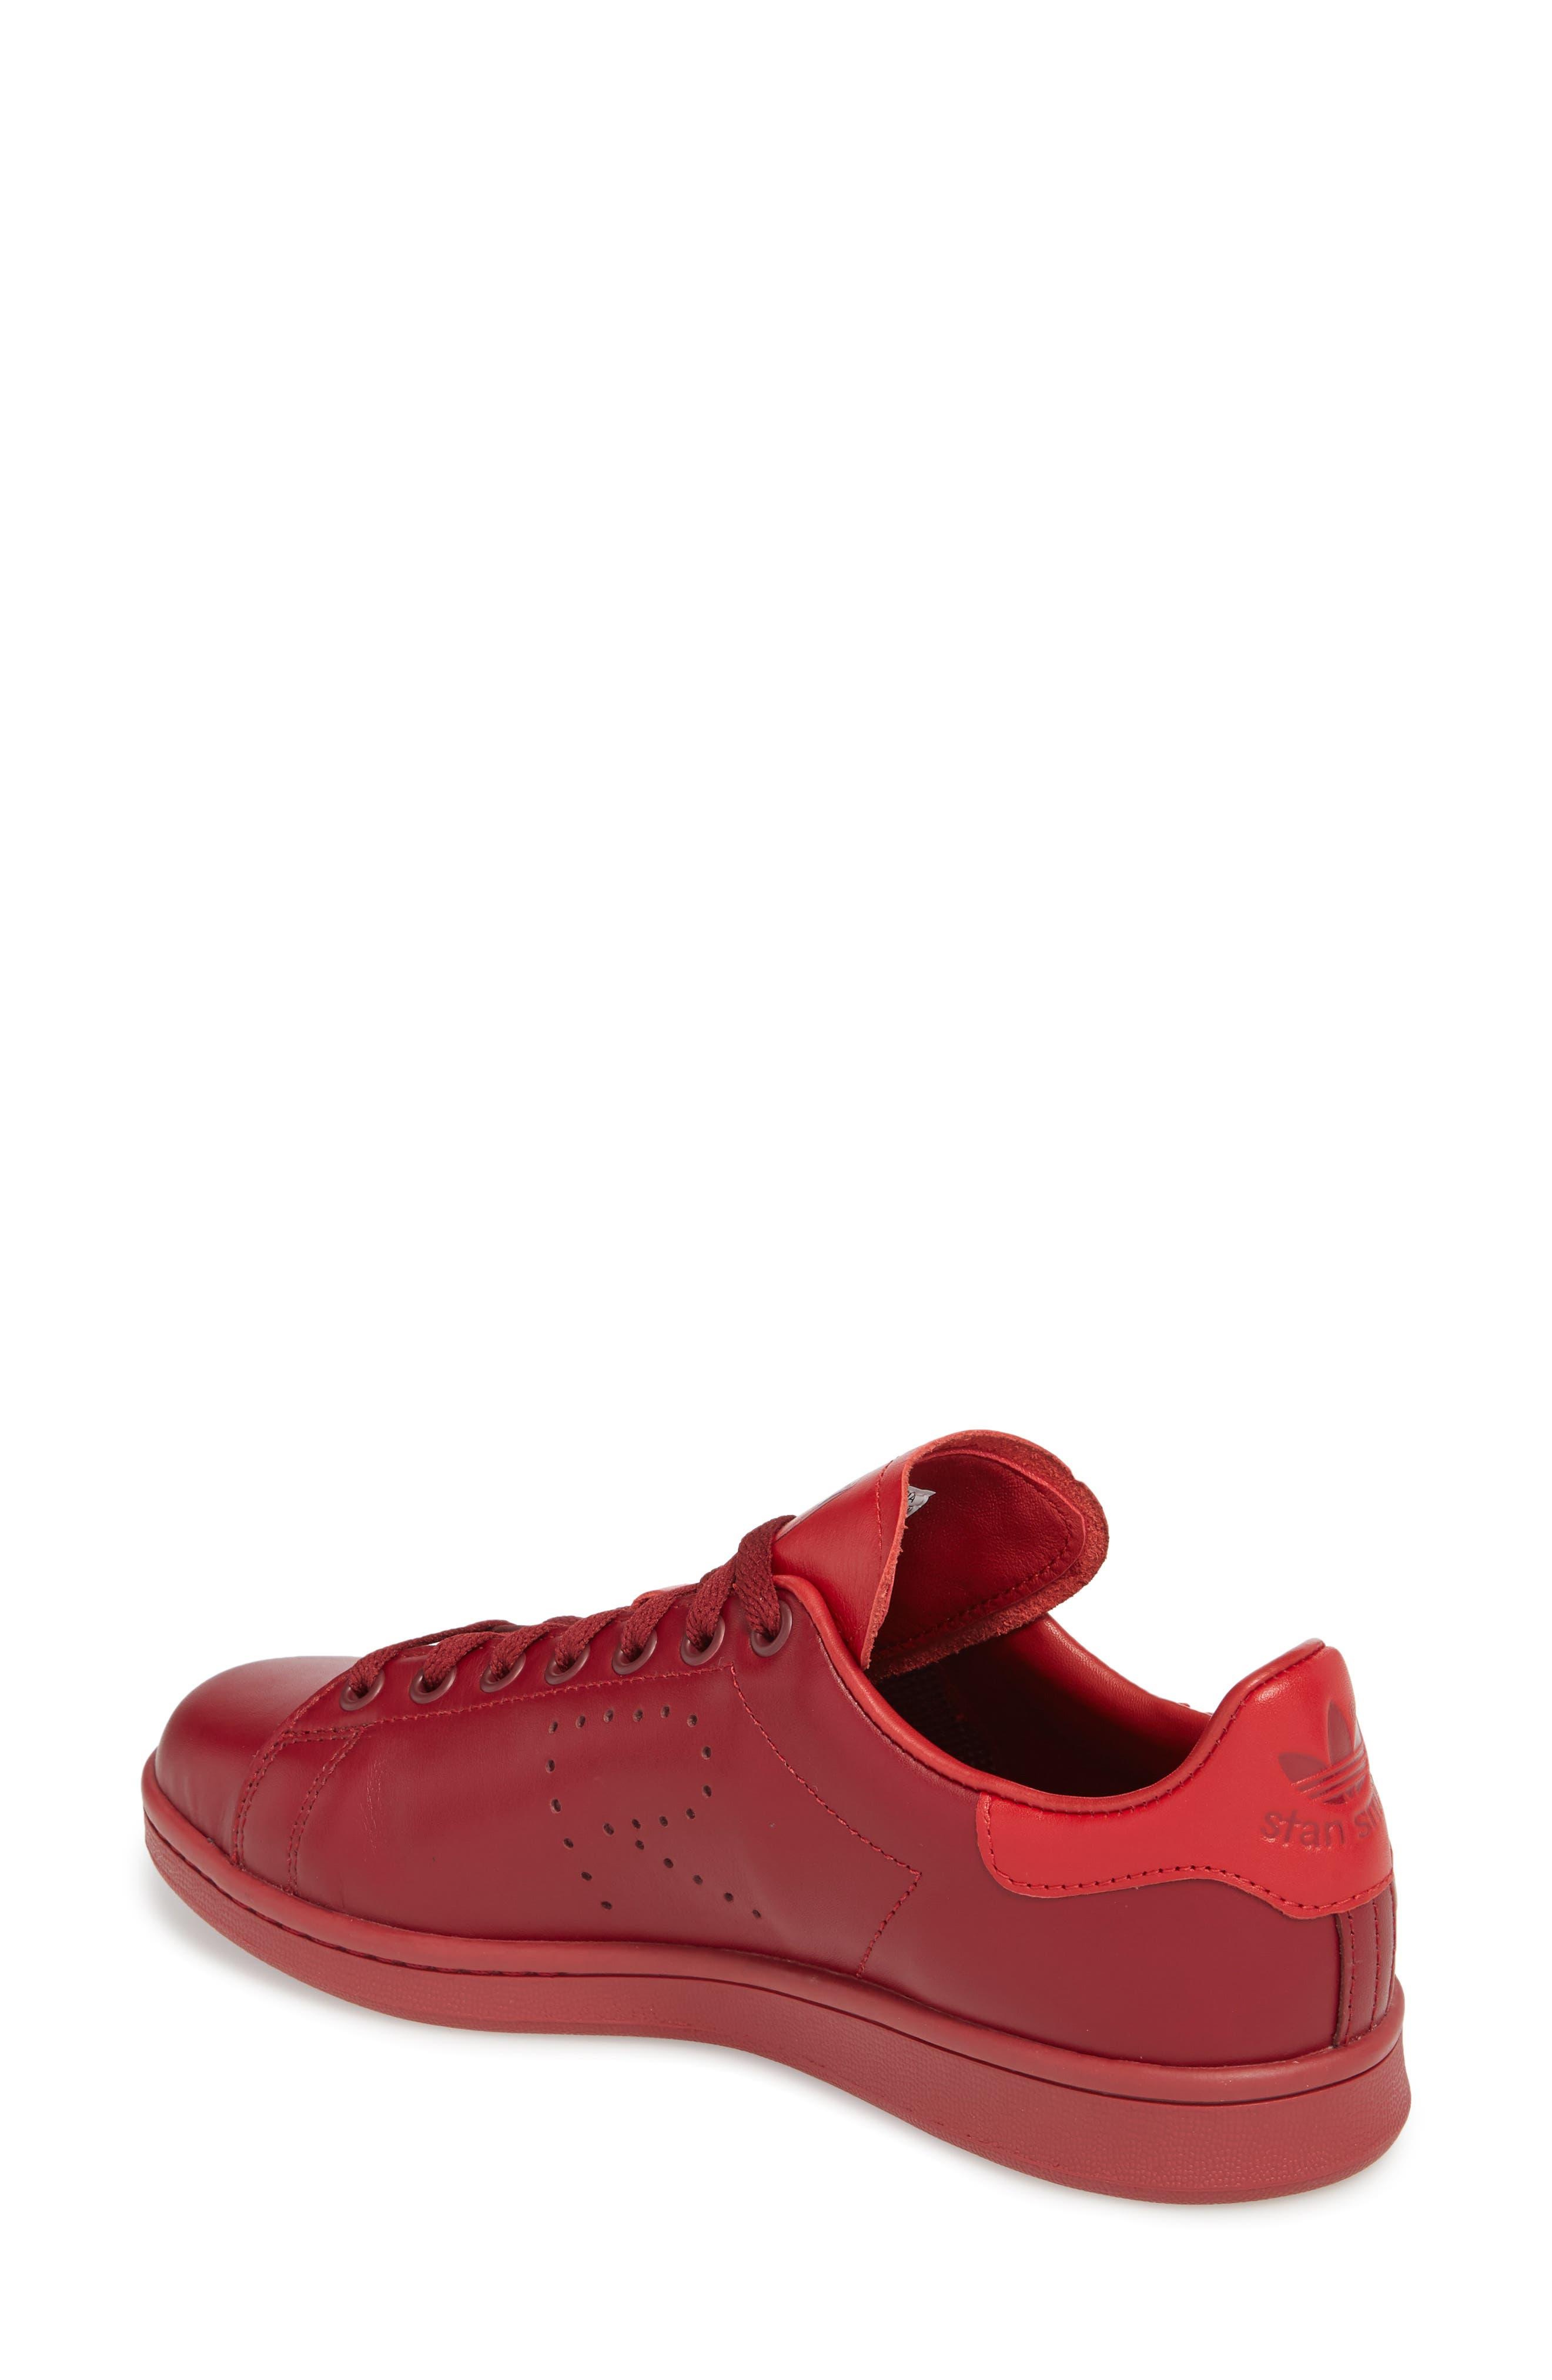 Stan Smith Sneaker,                             Alternate thumbnail 2, color,                             Burgundy/ Power Red/ Burgundy